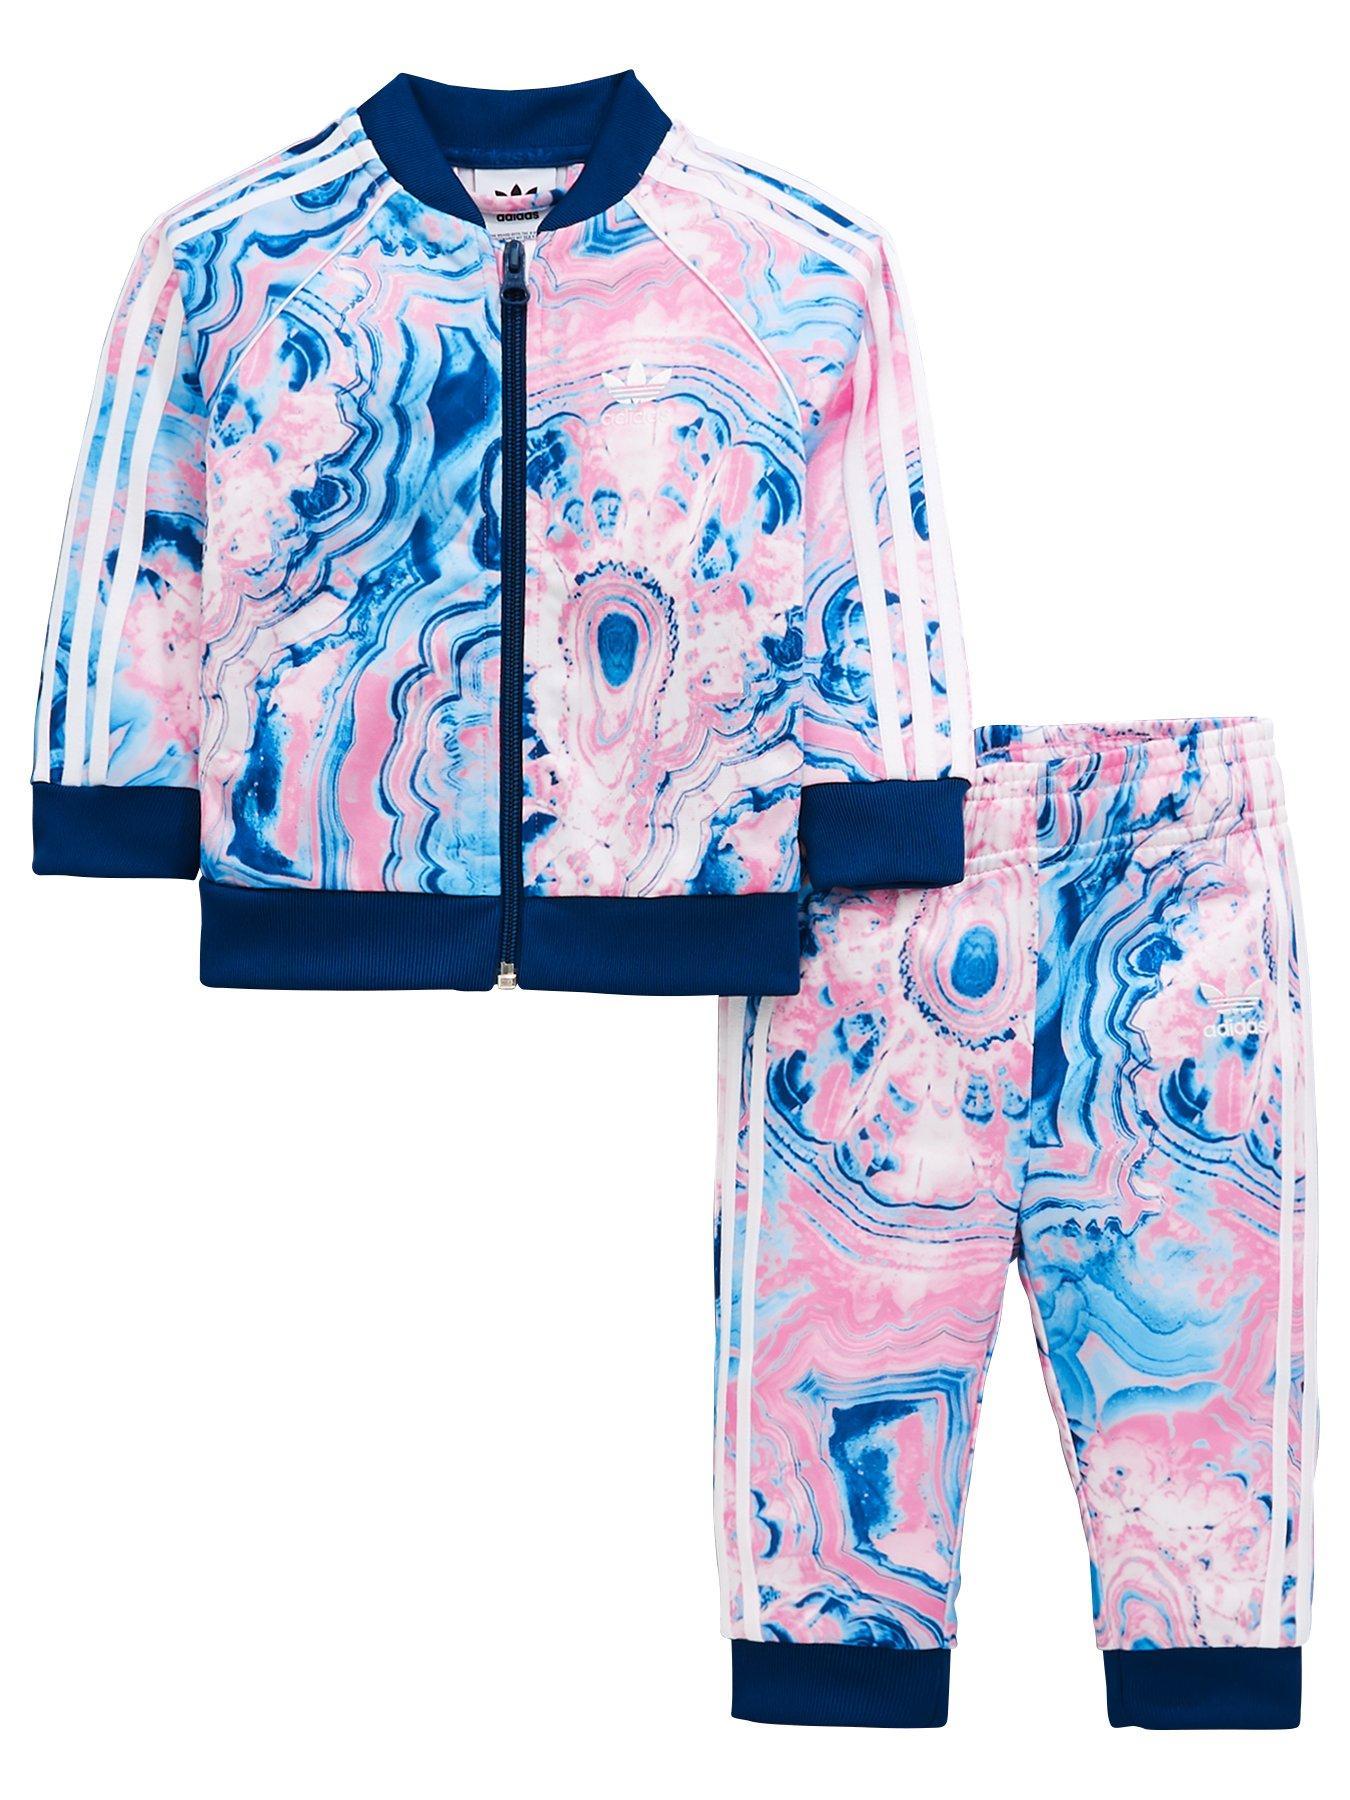 Summer Childrens Gym Exerciseamp; Fun Suit Set Kids Boys Fitness Adidas QdWCoBrxe